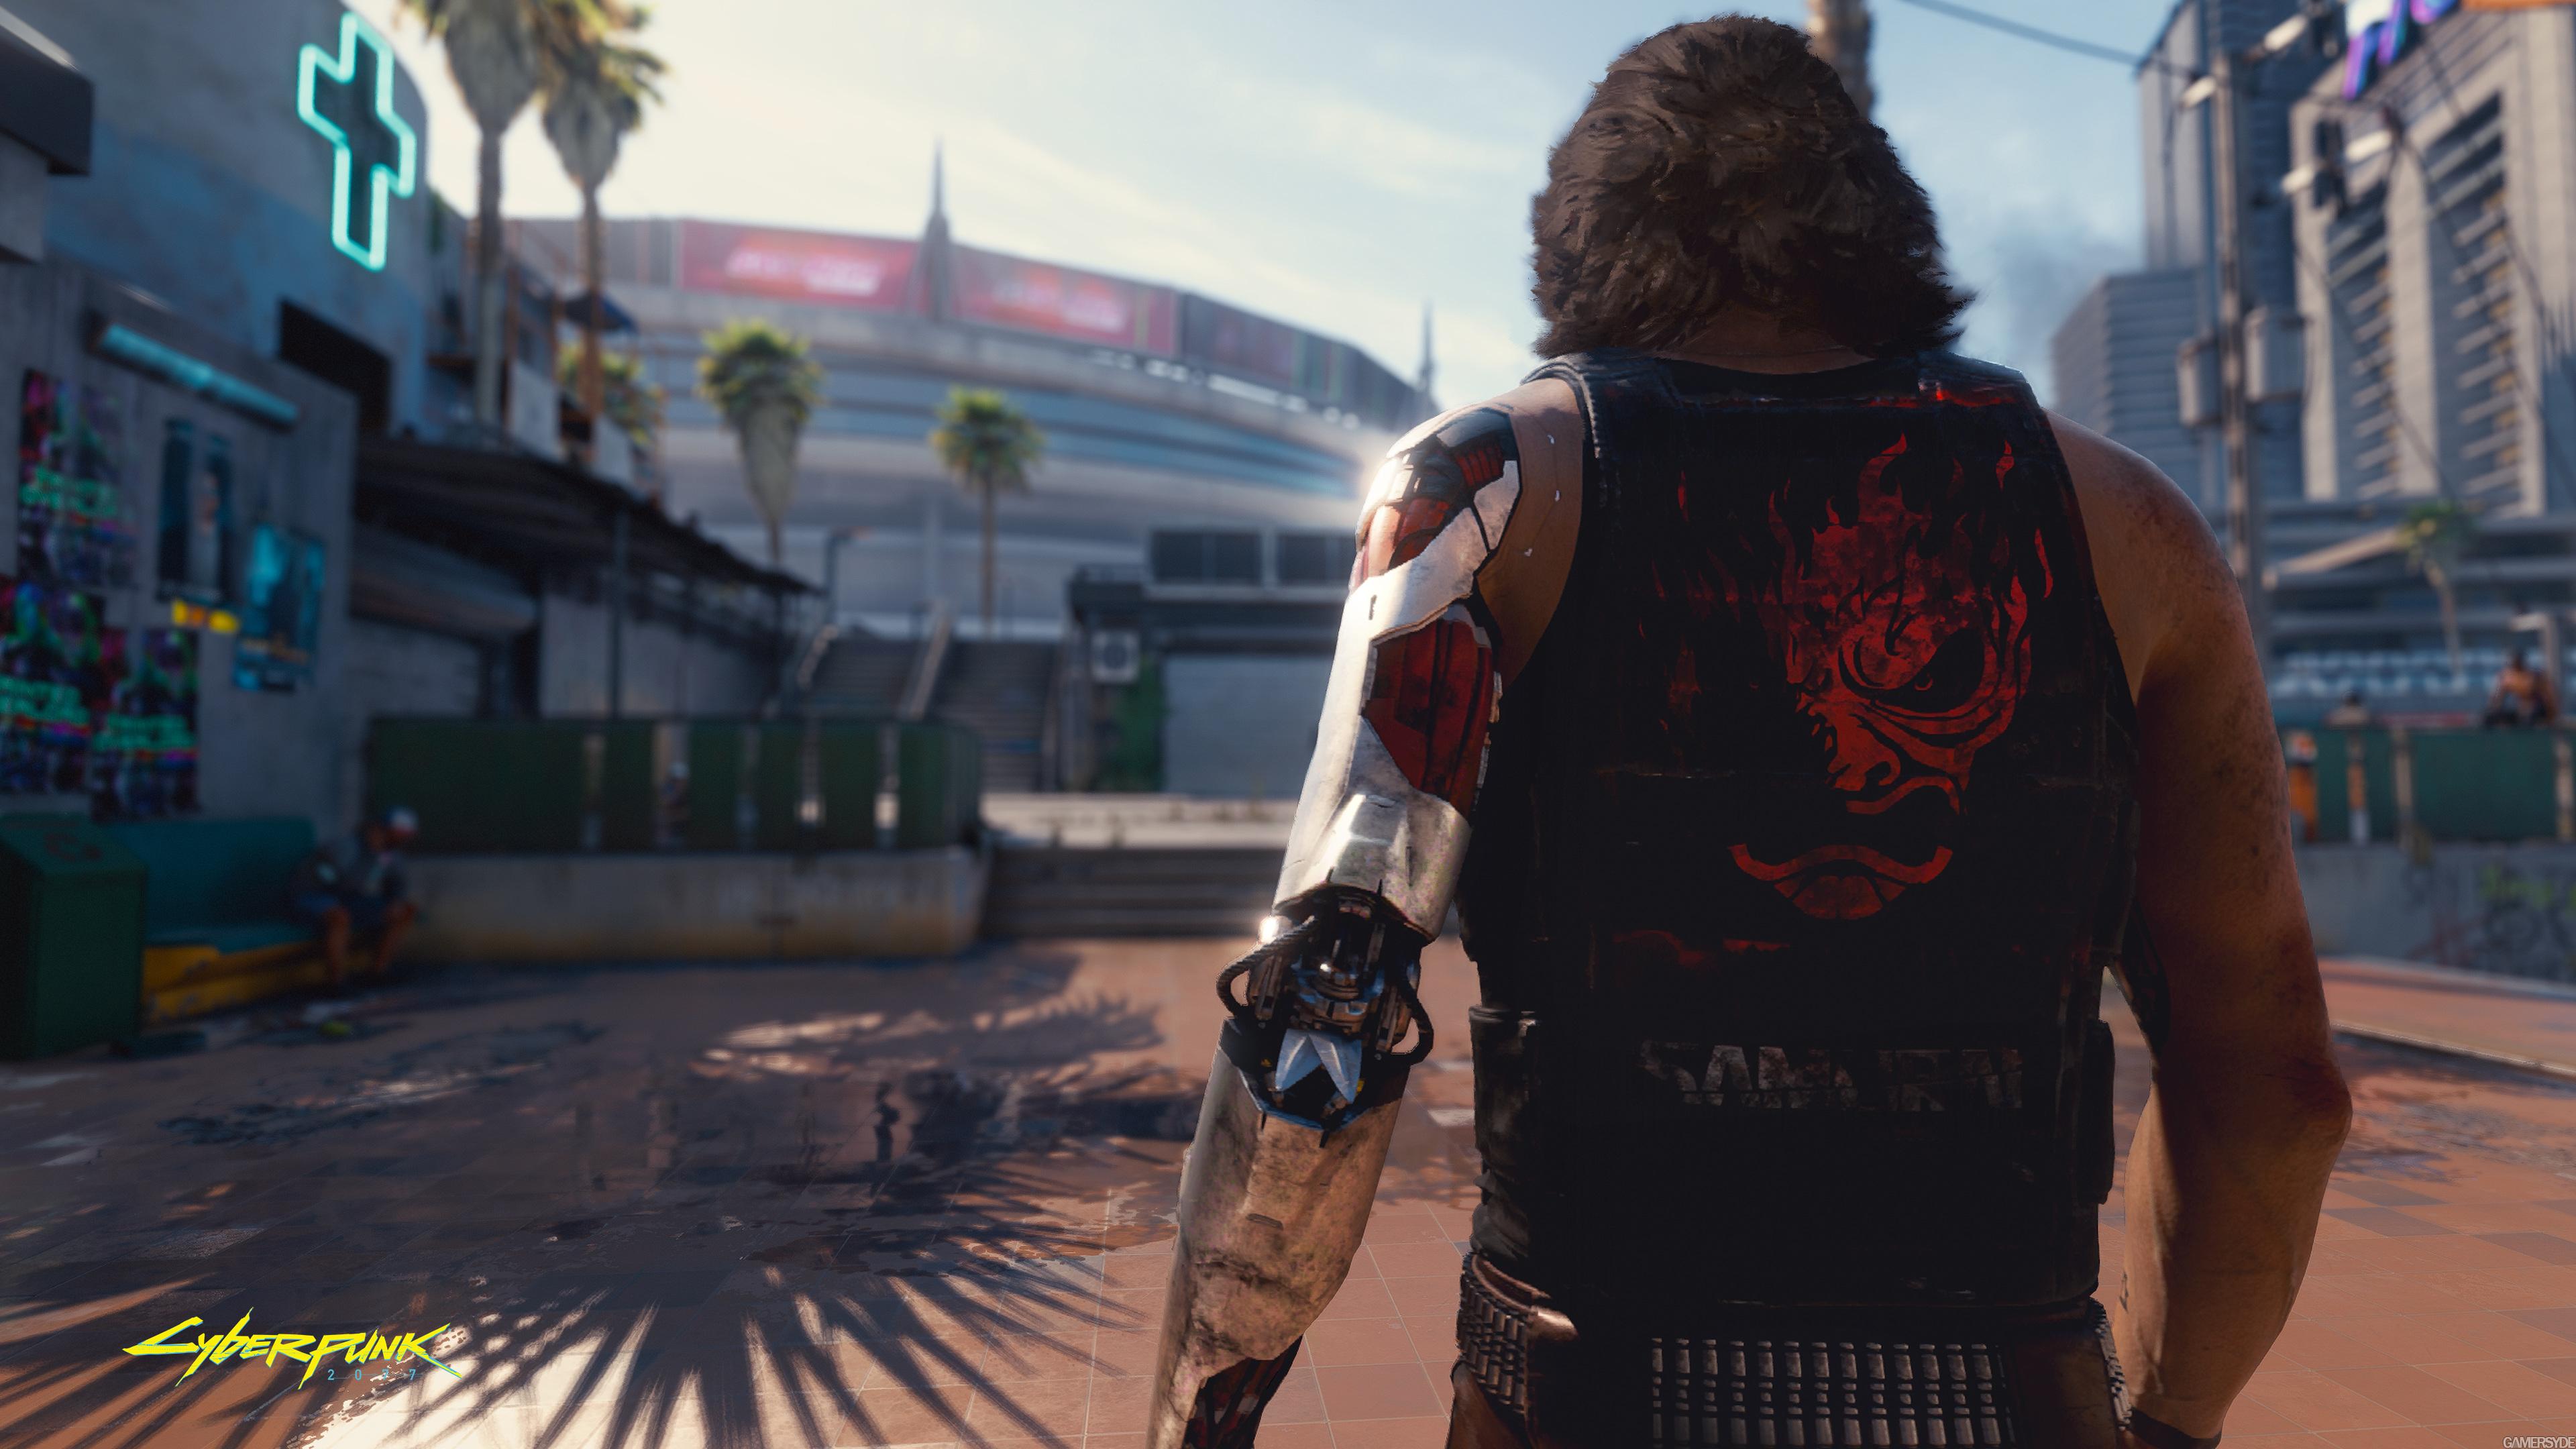 Cyberpunk 2077: скриншоты геймплея